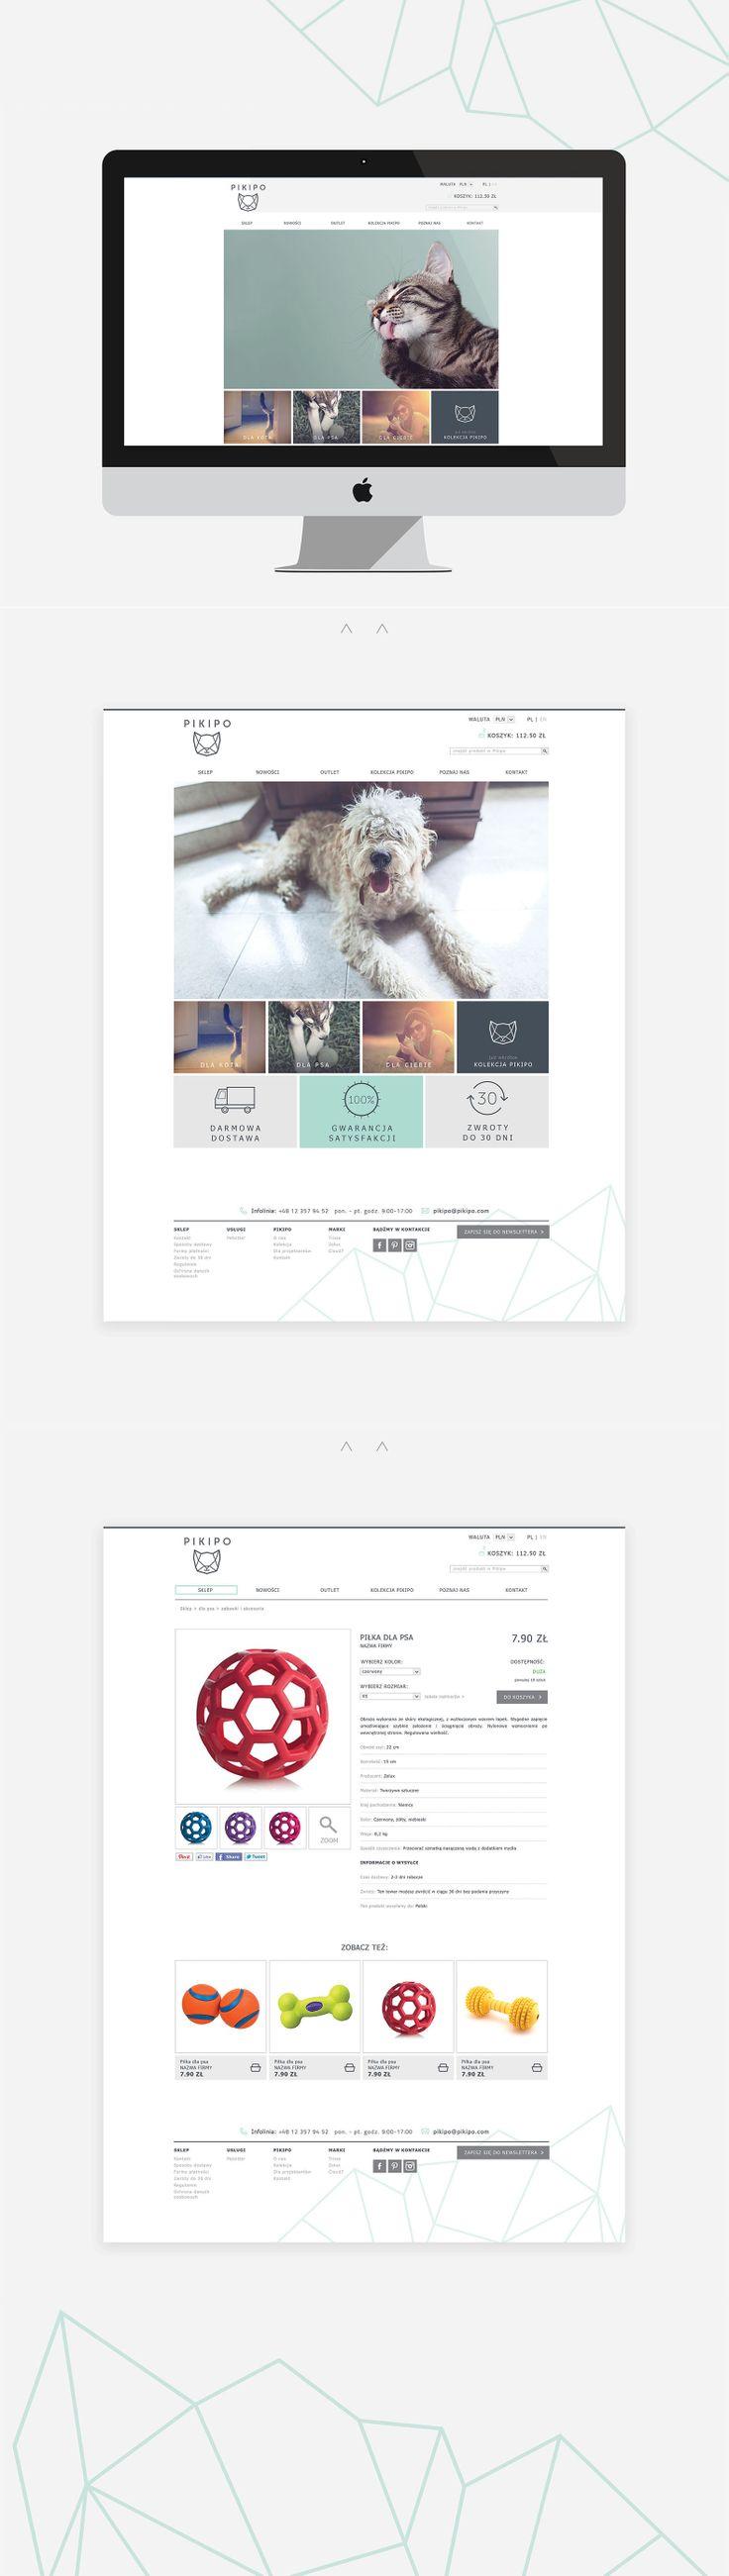 Pikipo #interface #design #UI #website #web